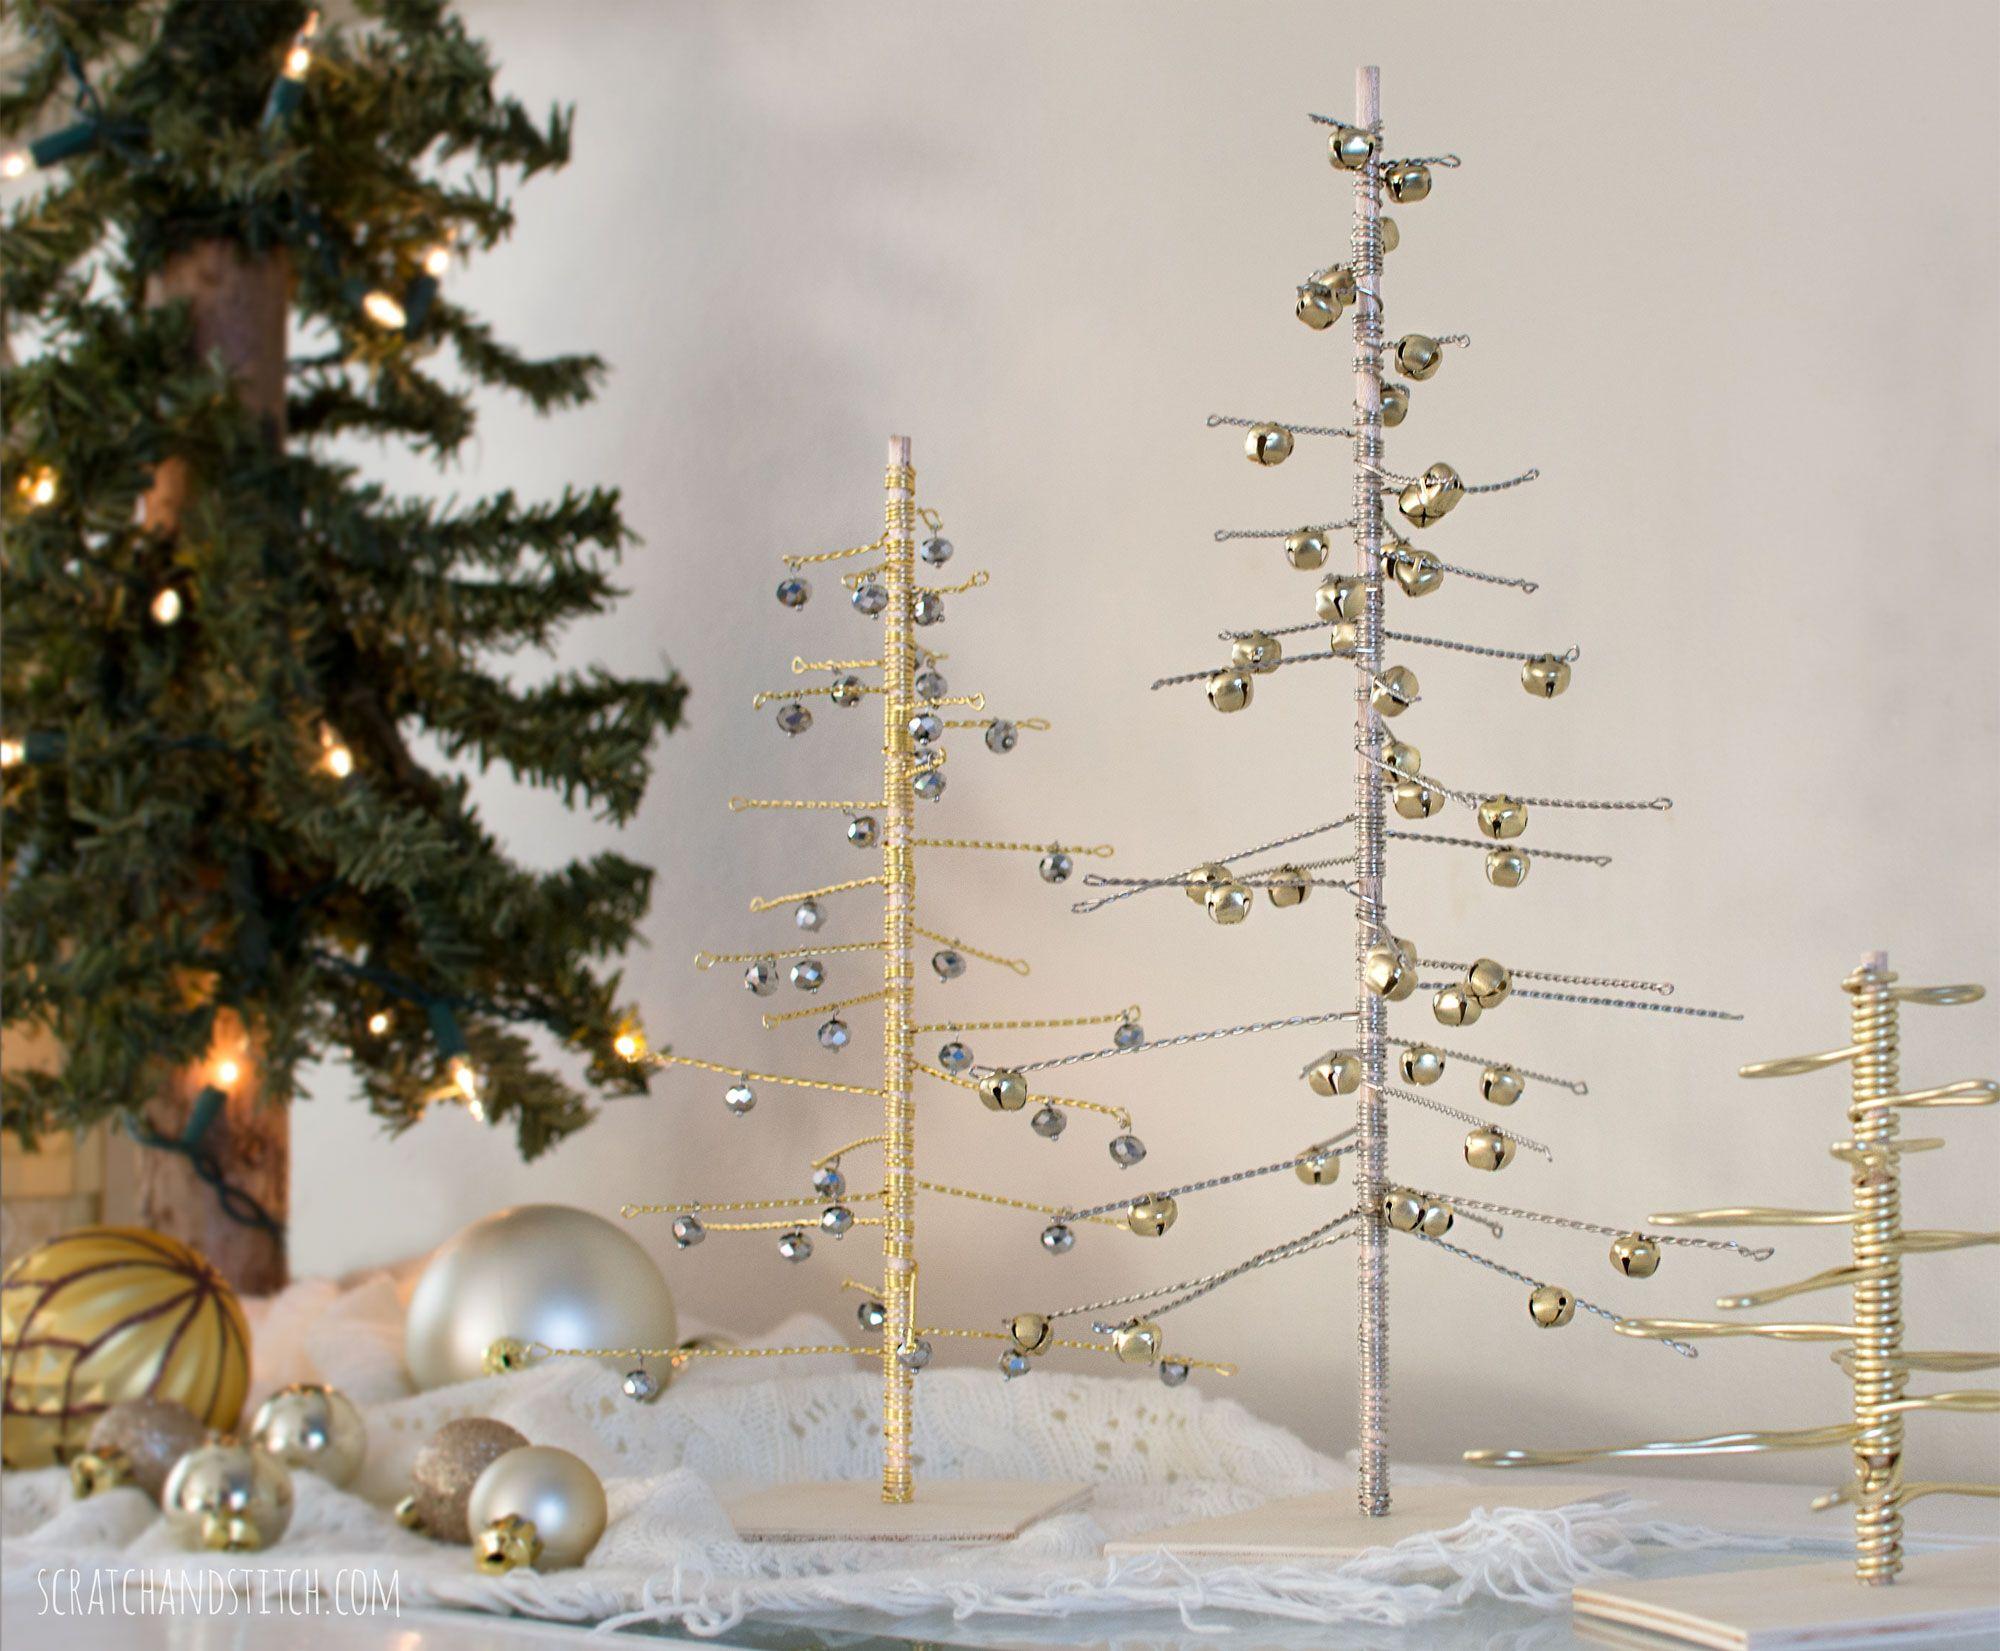 Handmade Wire Christmas Trees By Scratchandstitch Com Christmas Tree Xmas Tree Ornament Dollar Tree Christmas